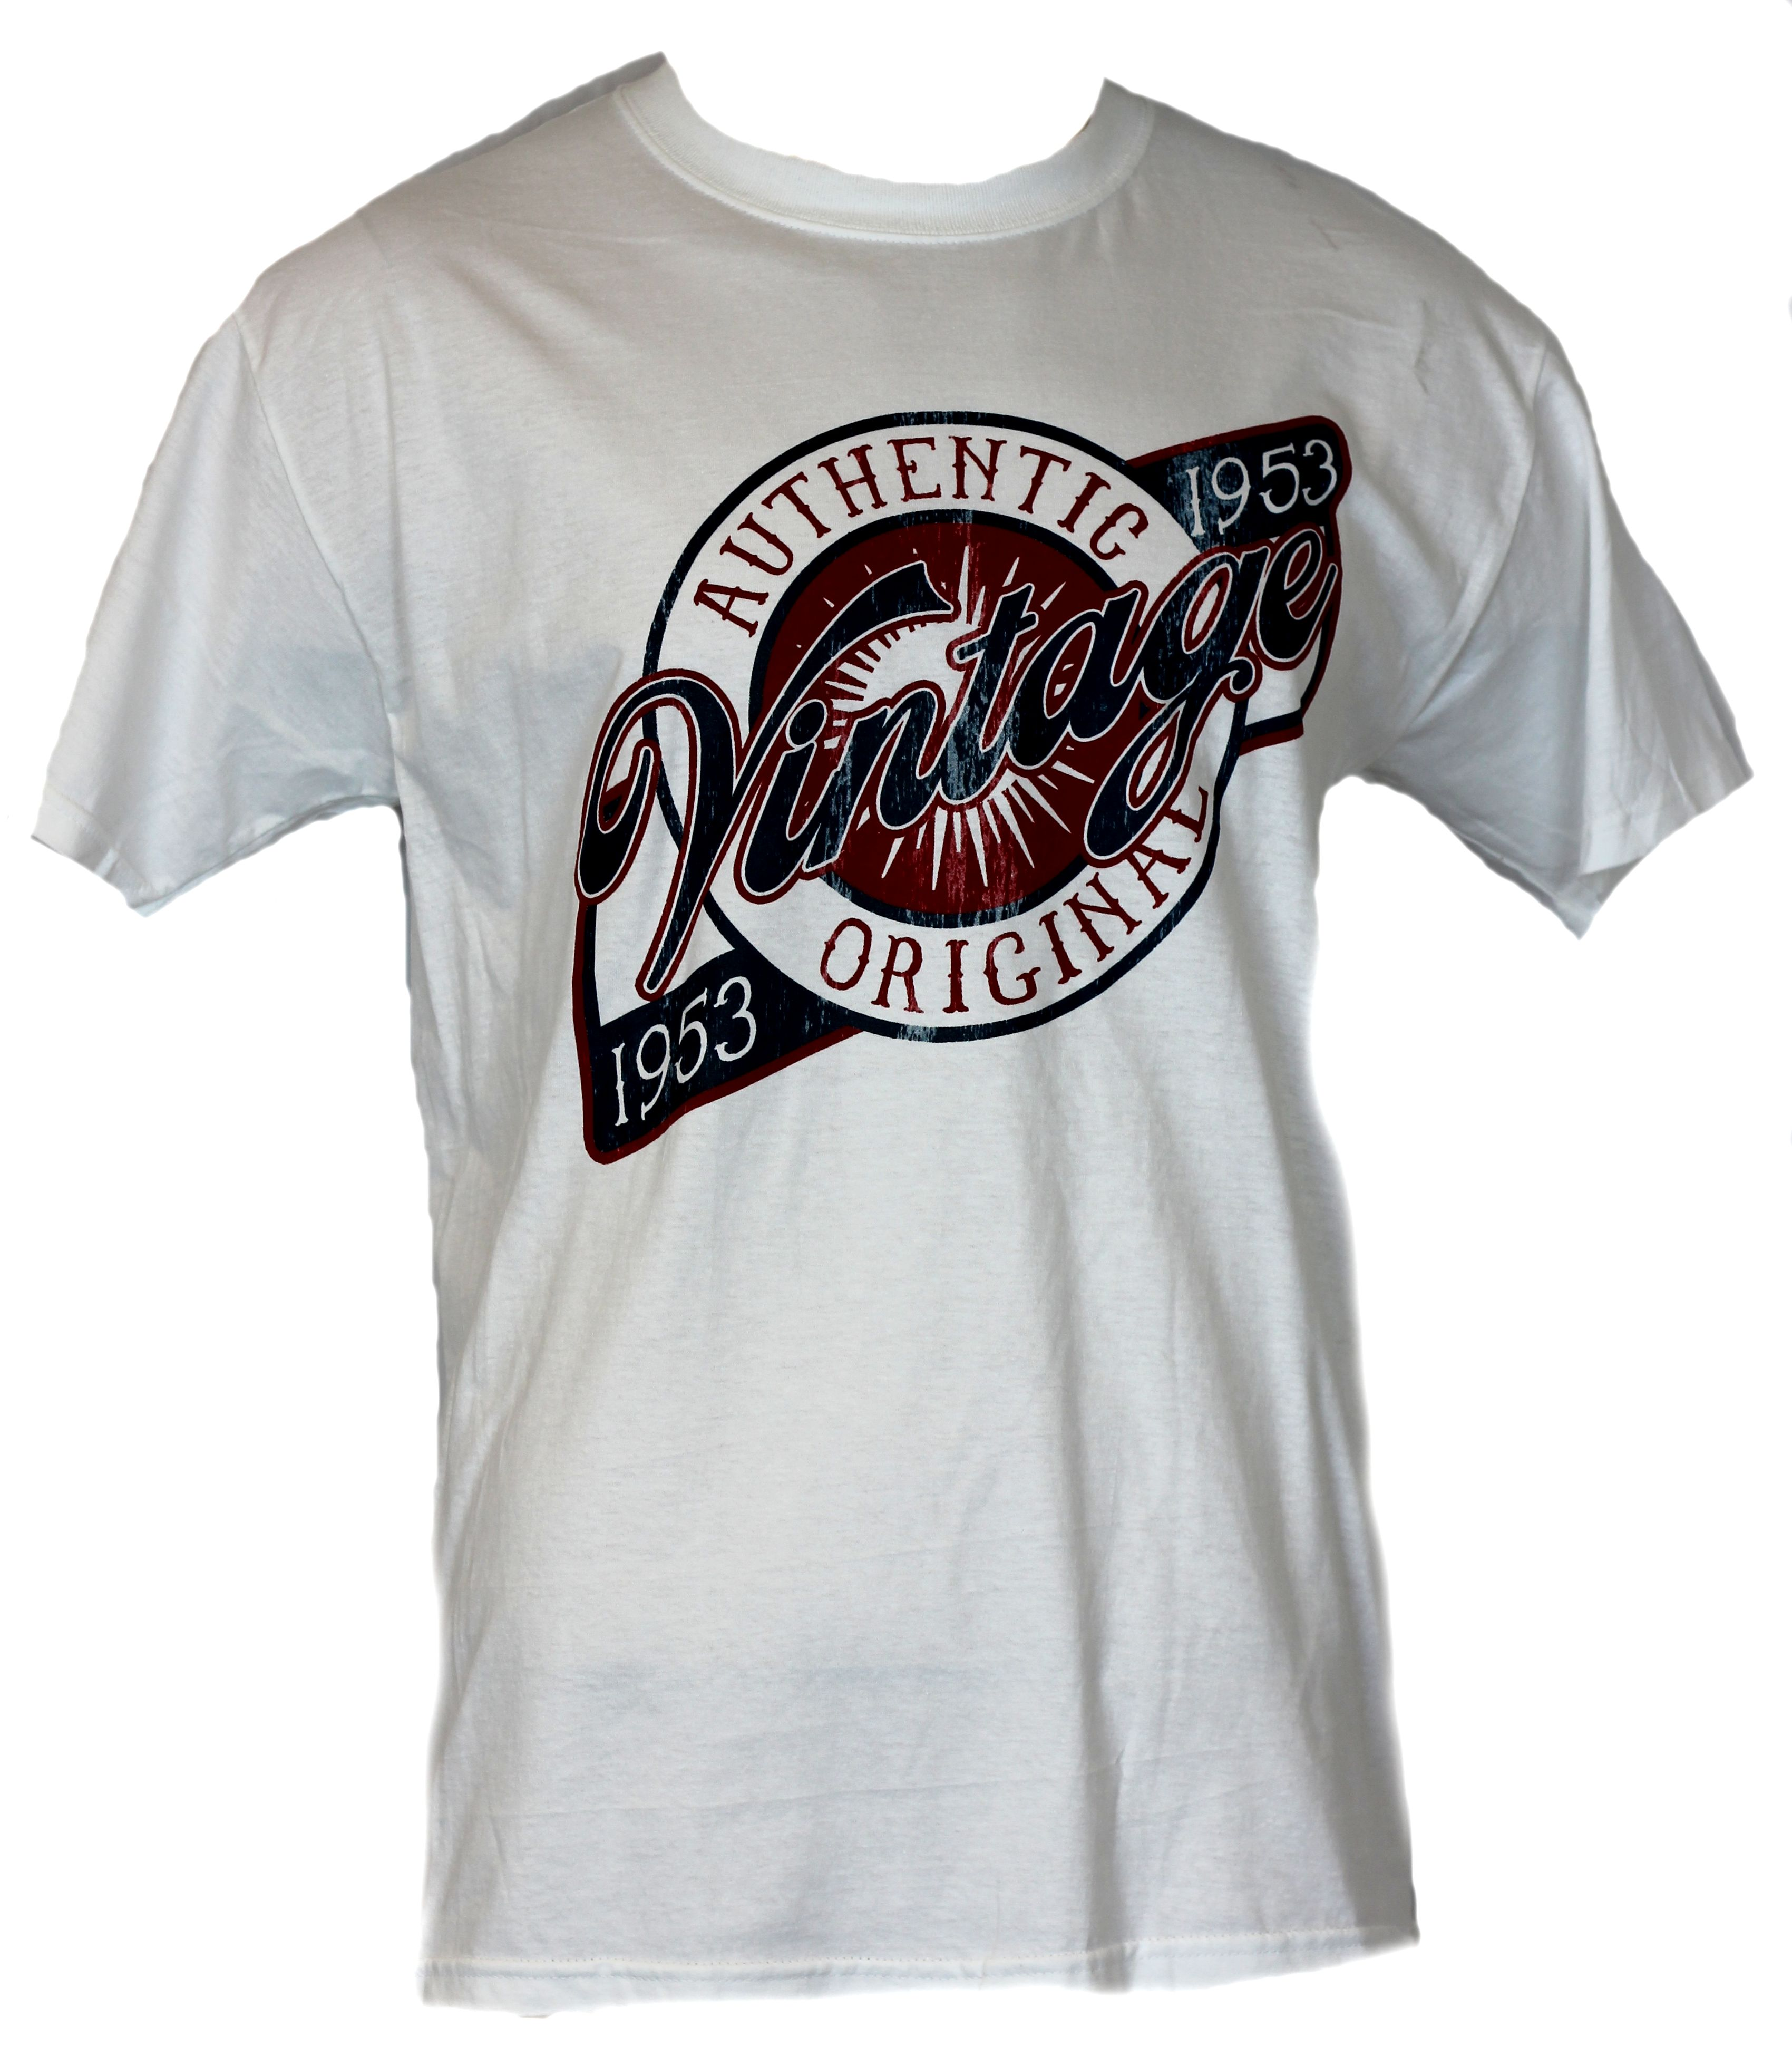 authentic vintage mens t shirt birthday 1953 shirt